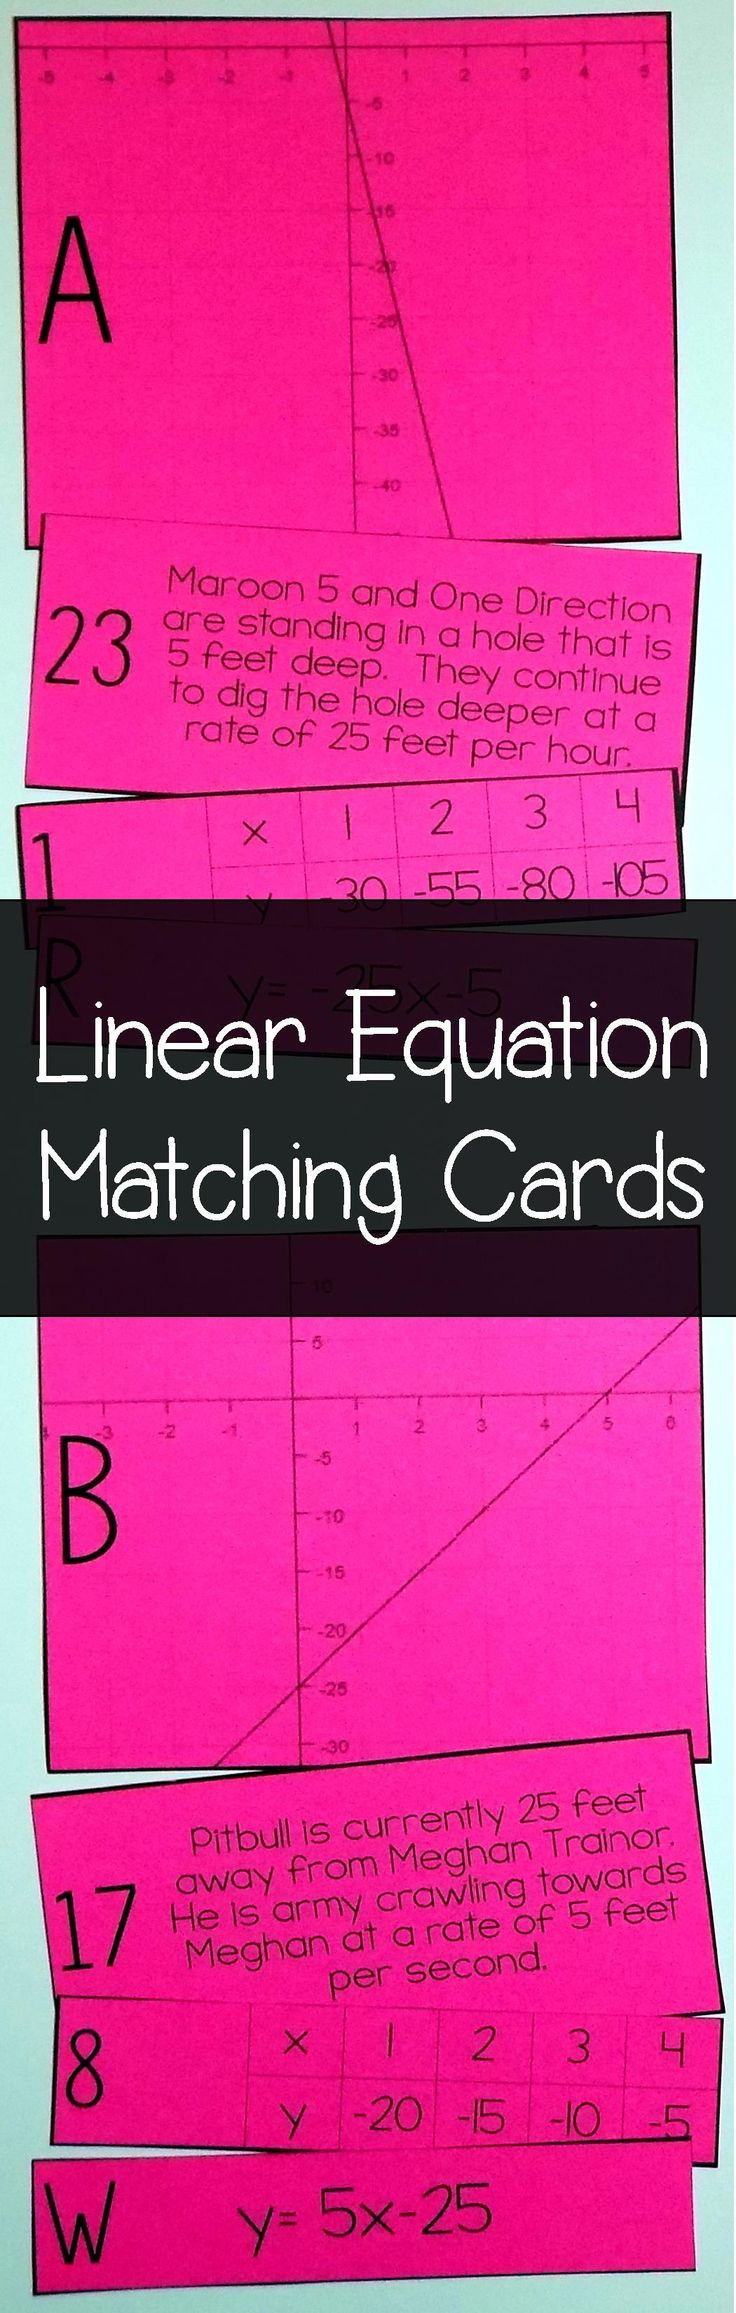 Linear Equation Card Match Slope Intercept Form Algebra Word